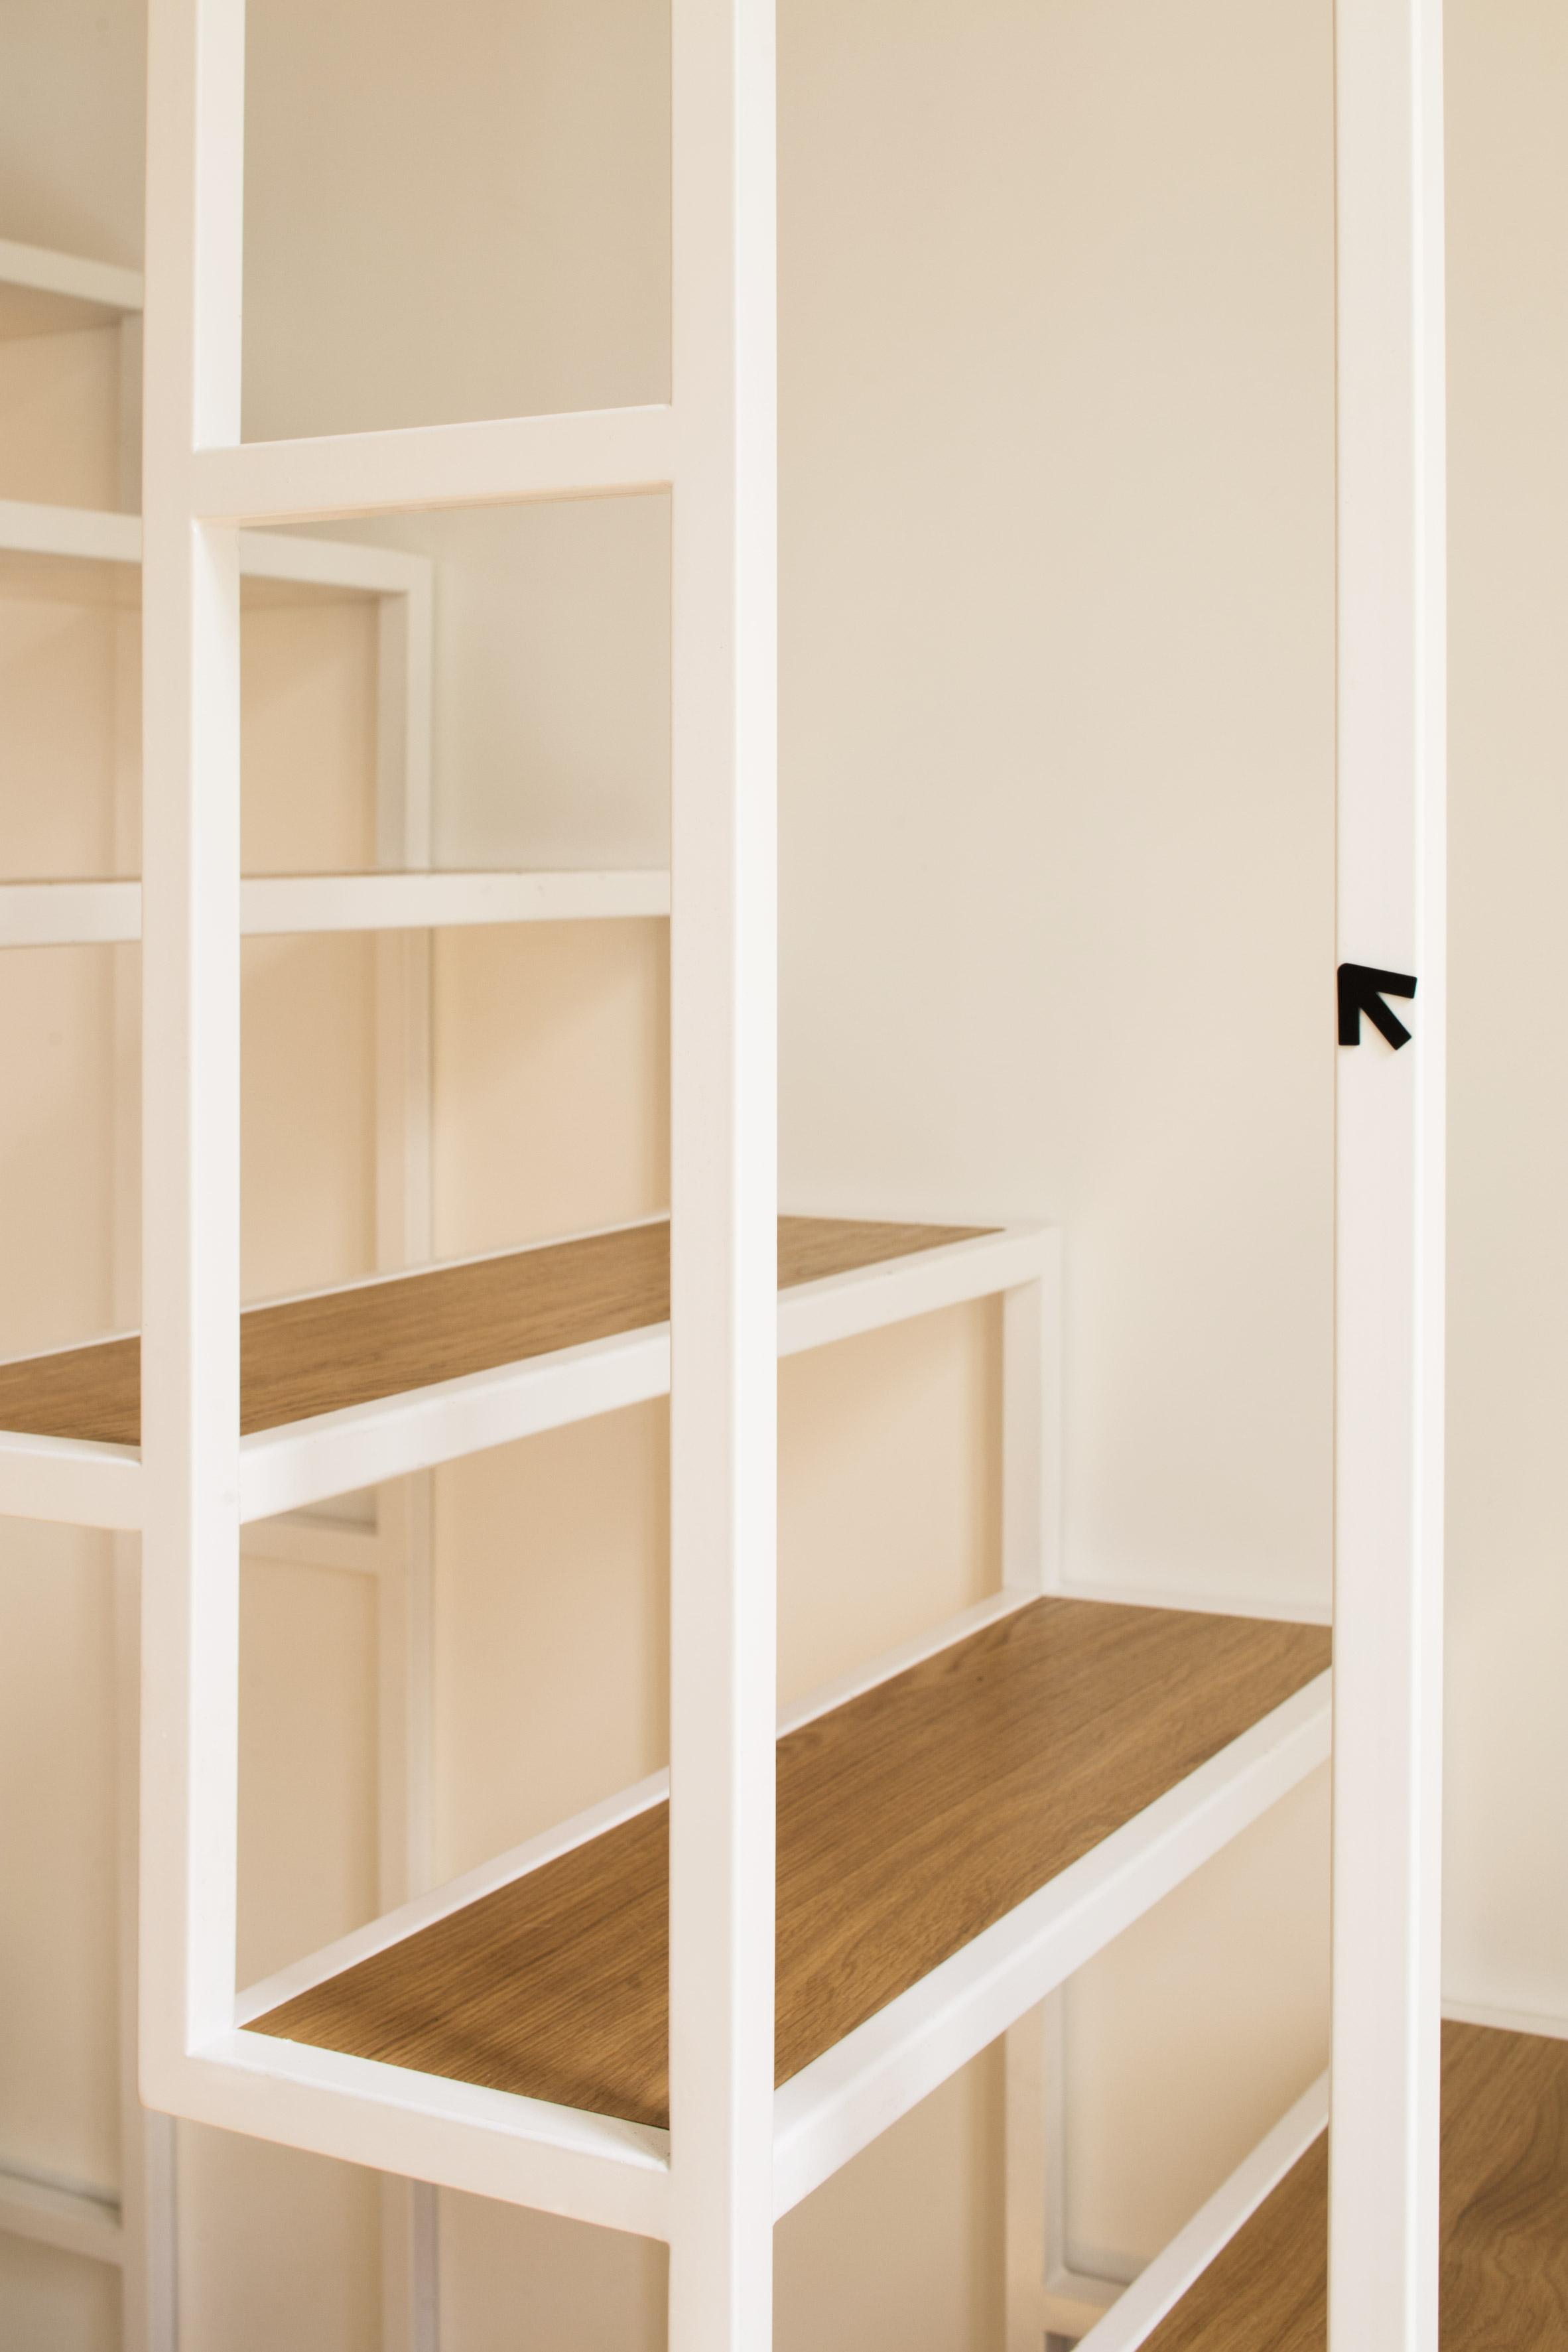 architecture-paris-apartment-design-studia-interiors-osnovadesign-osnova-poltava_11